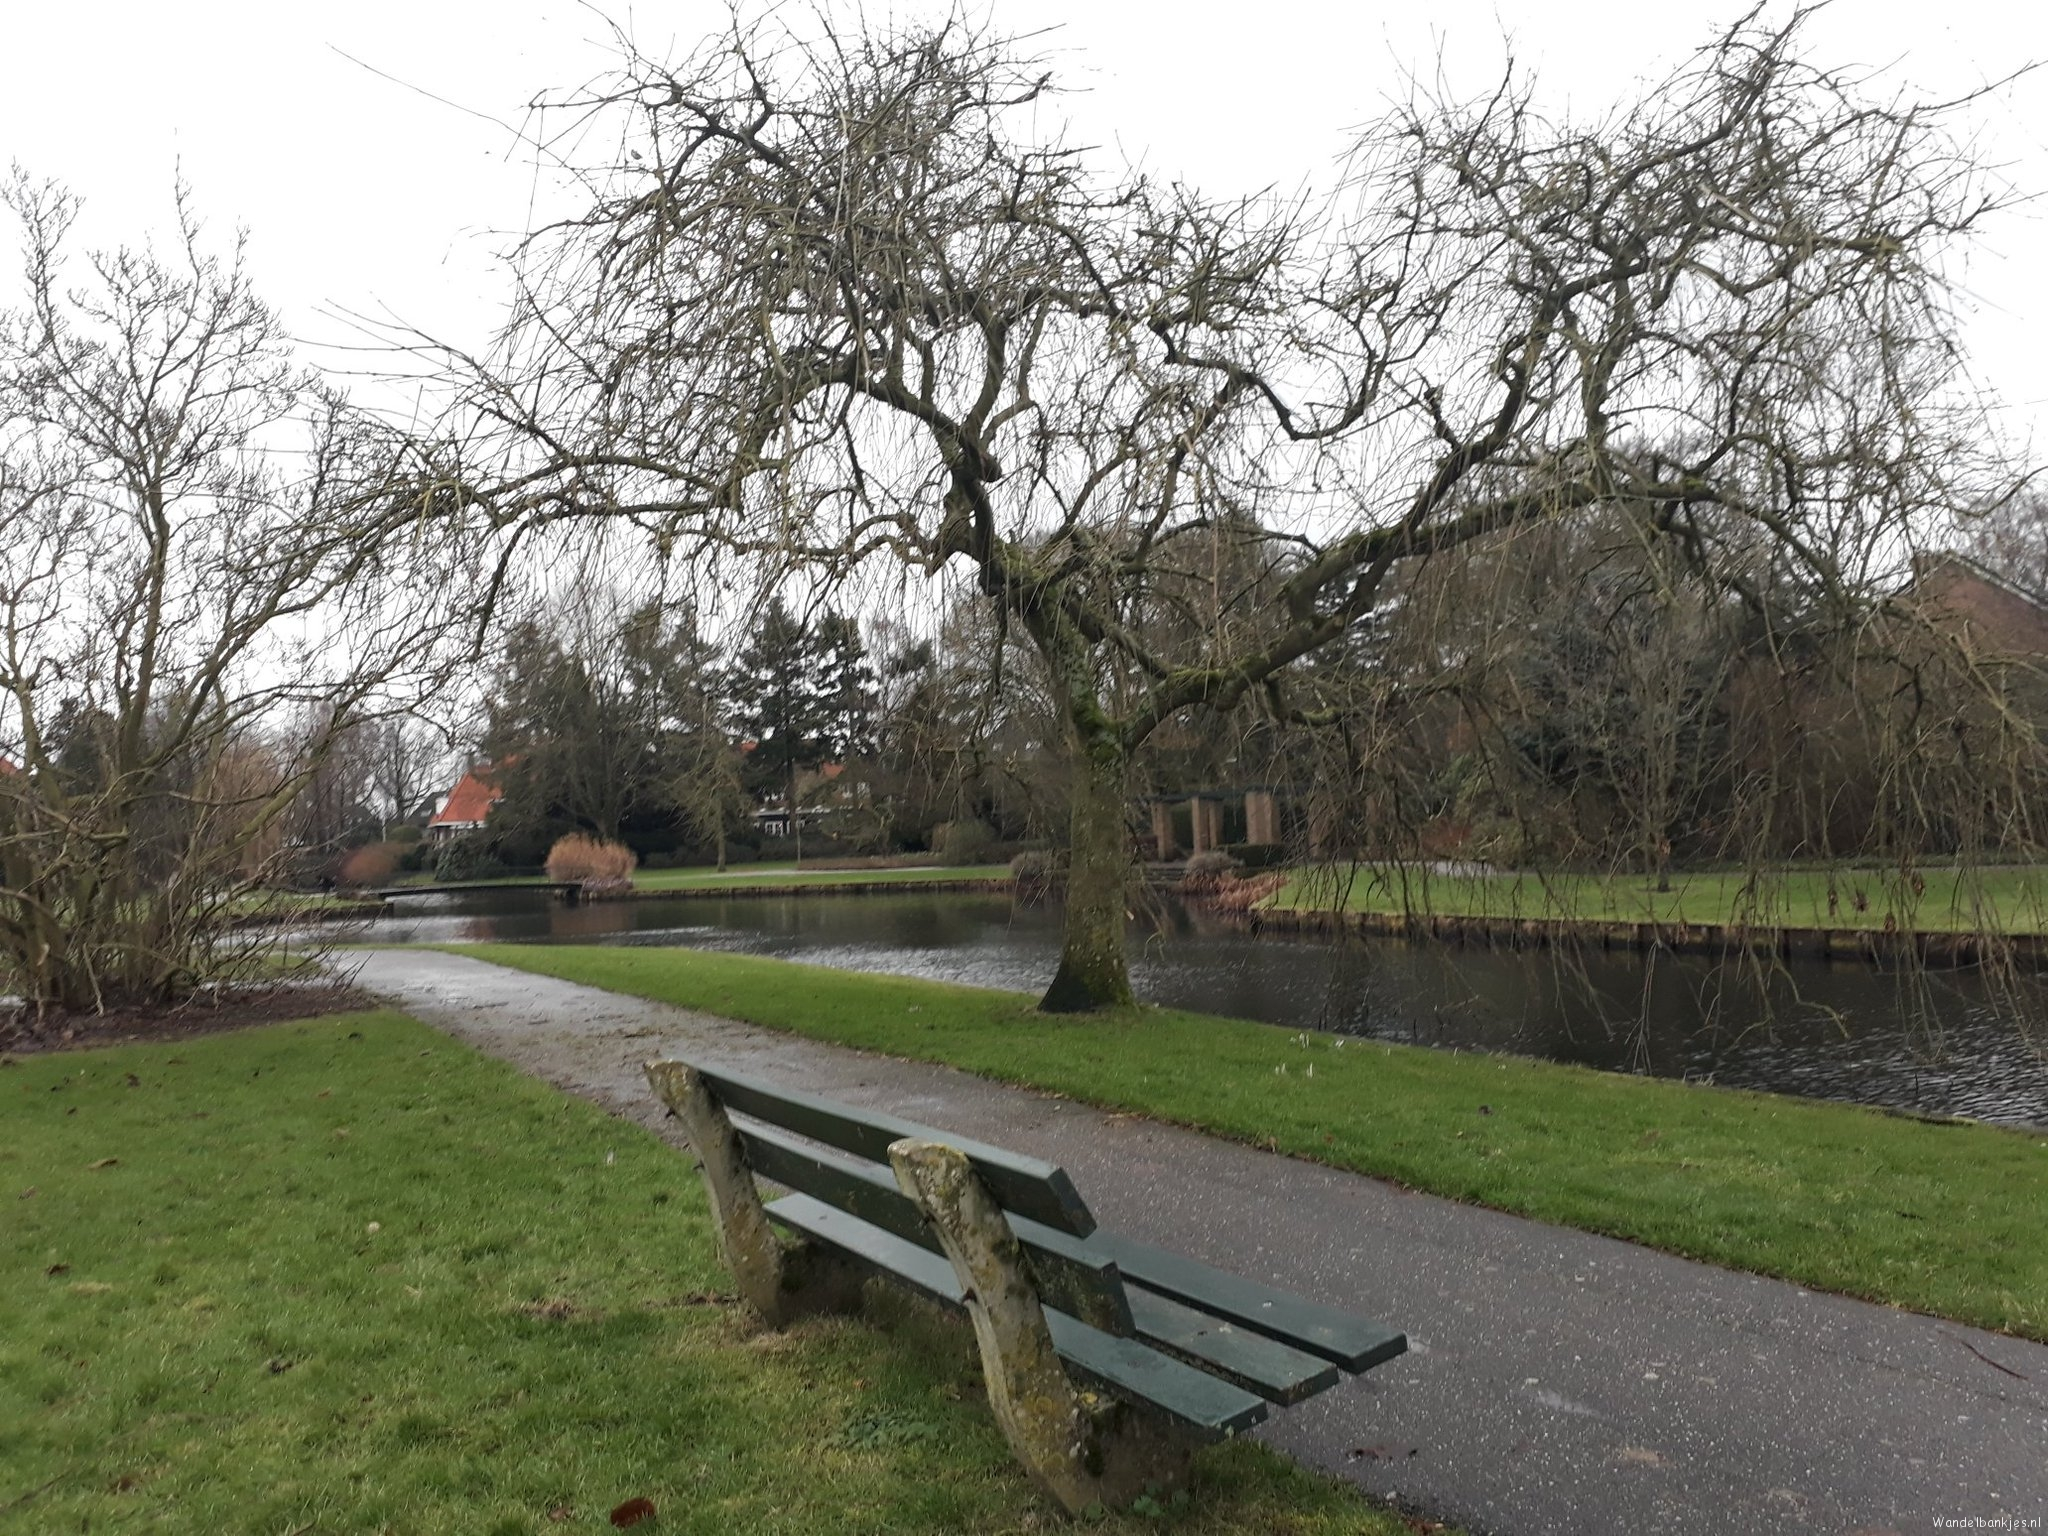 rt-wendelavanbeek-walkersbenches-walking-benches-beautiful-place-in-bilderdijkpark-in-bussum-throw-lakes-https-t-co-s0hbguvyvt